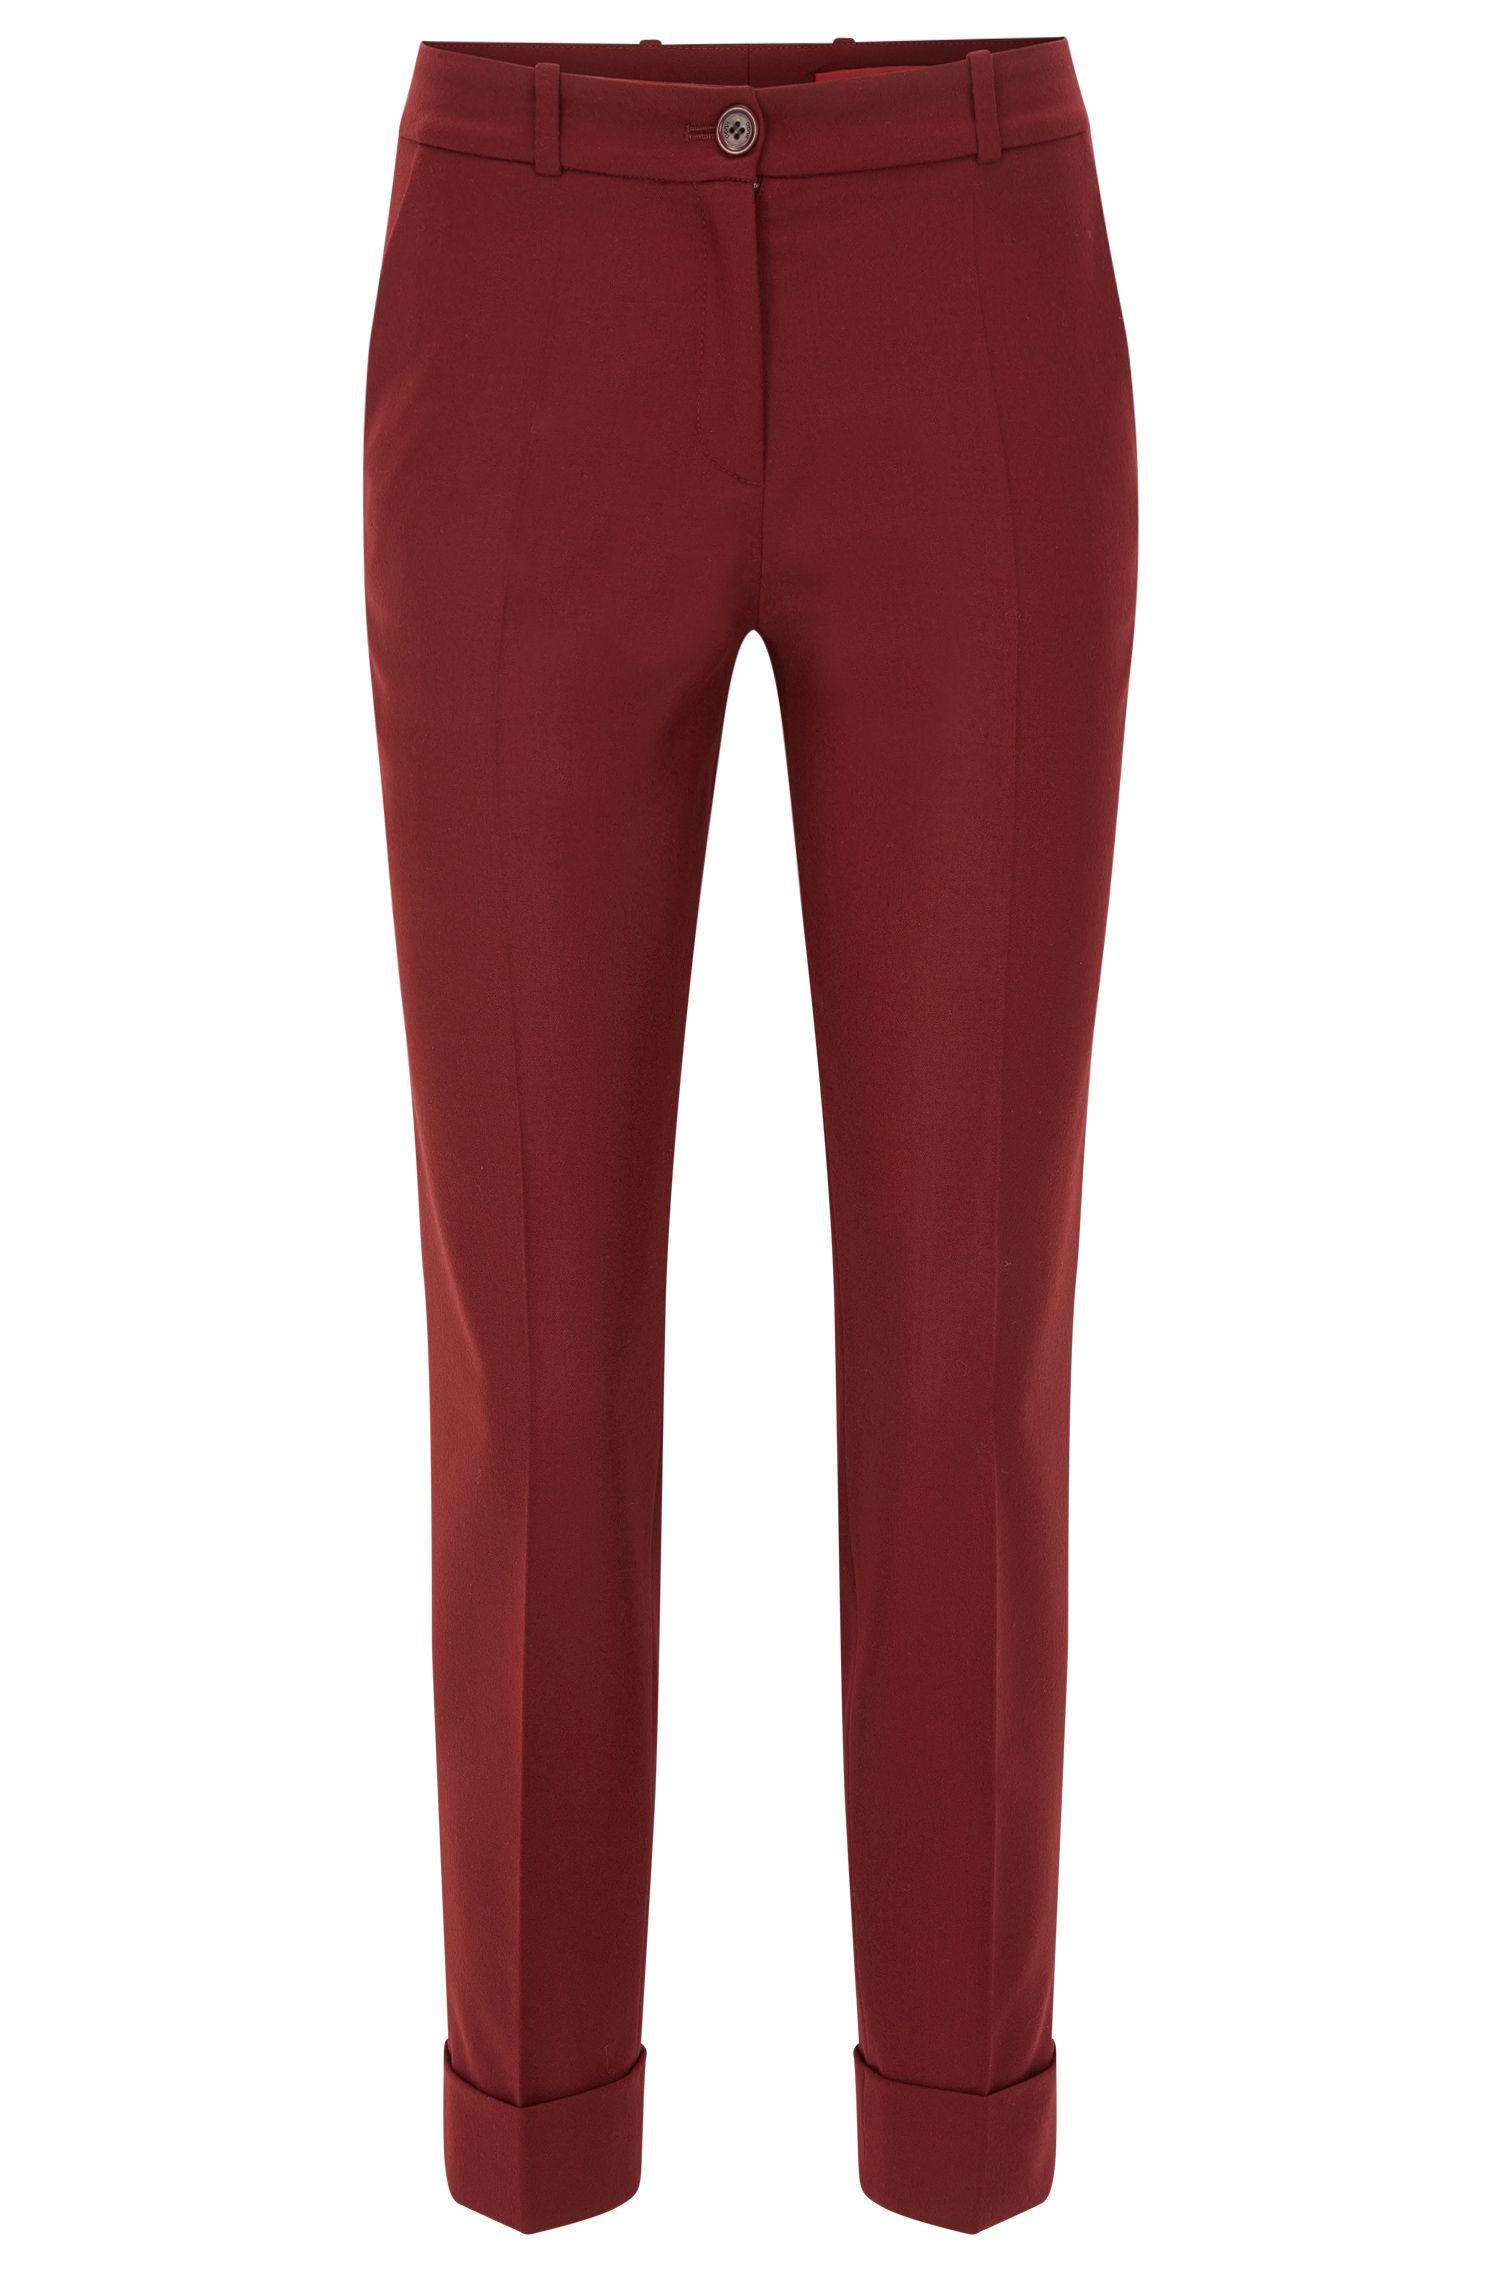 'Hulya' | Stretch Virgin Wool Pants